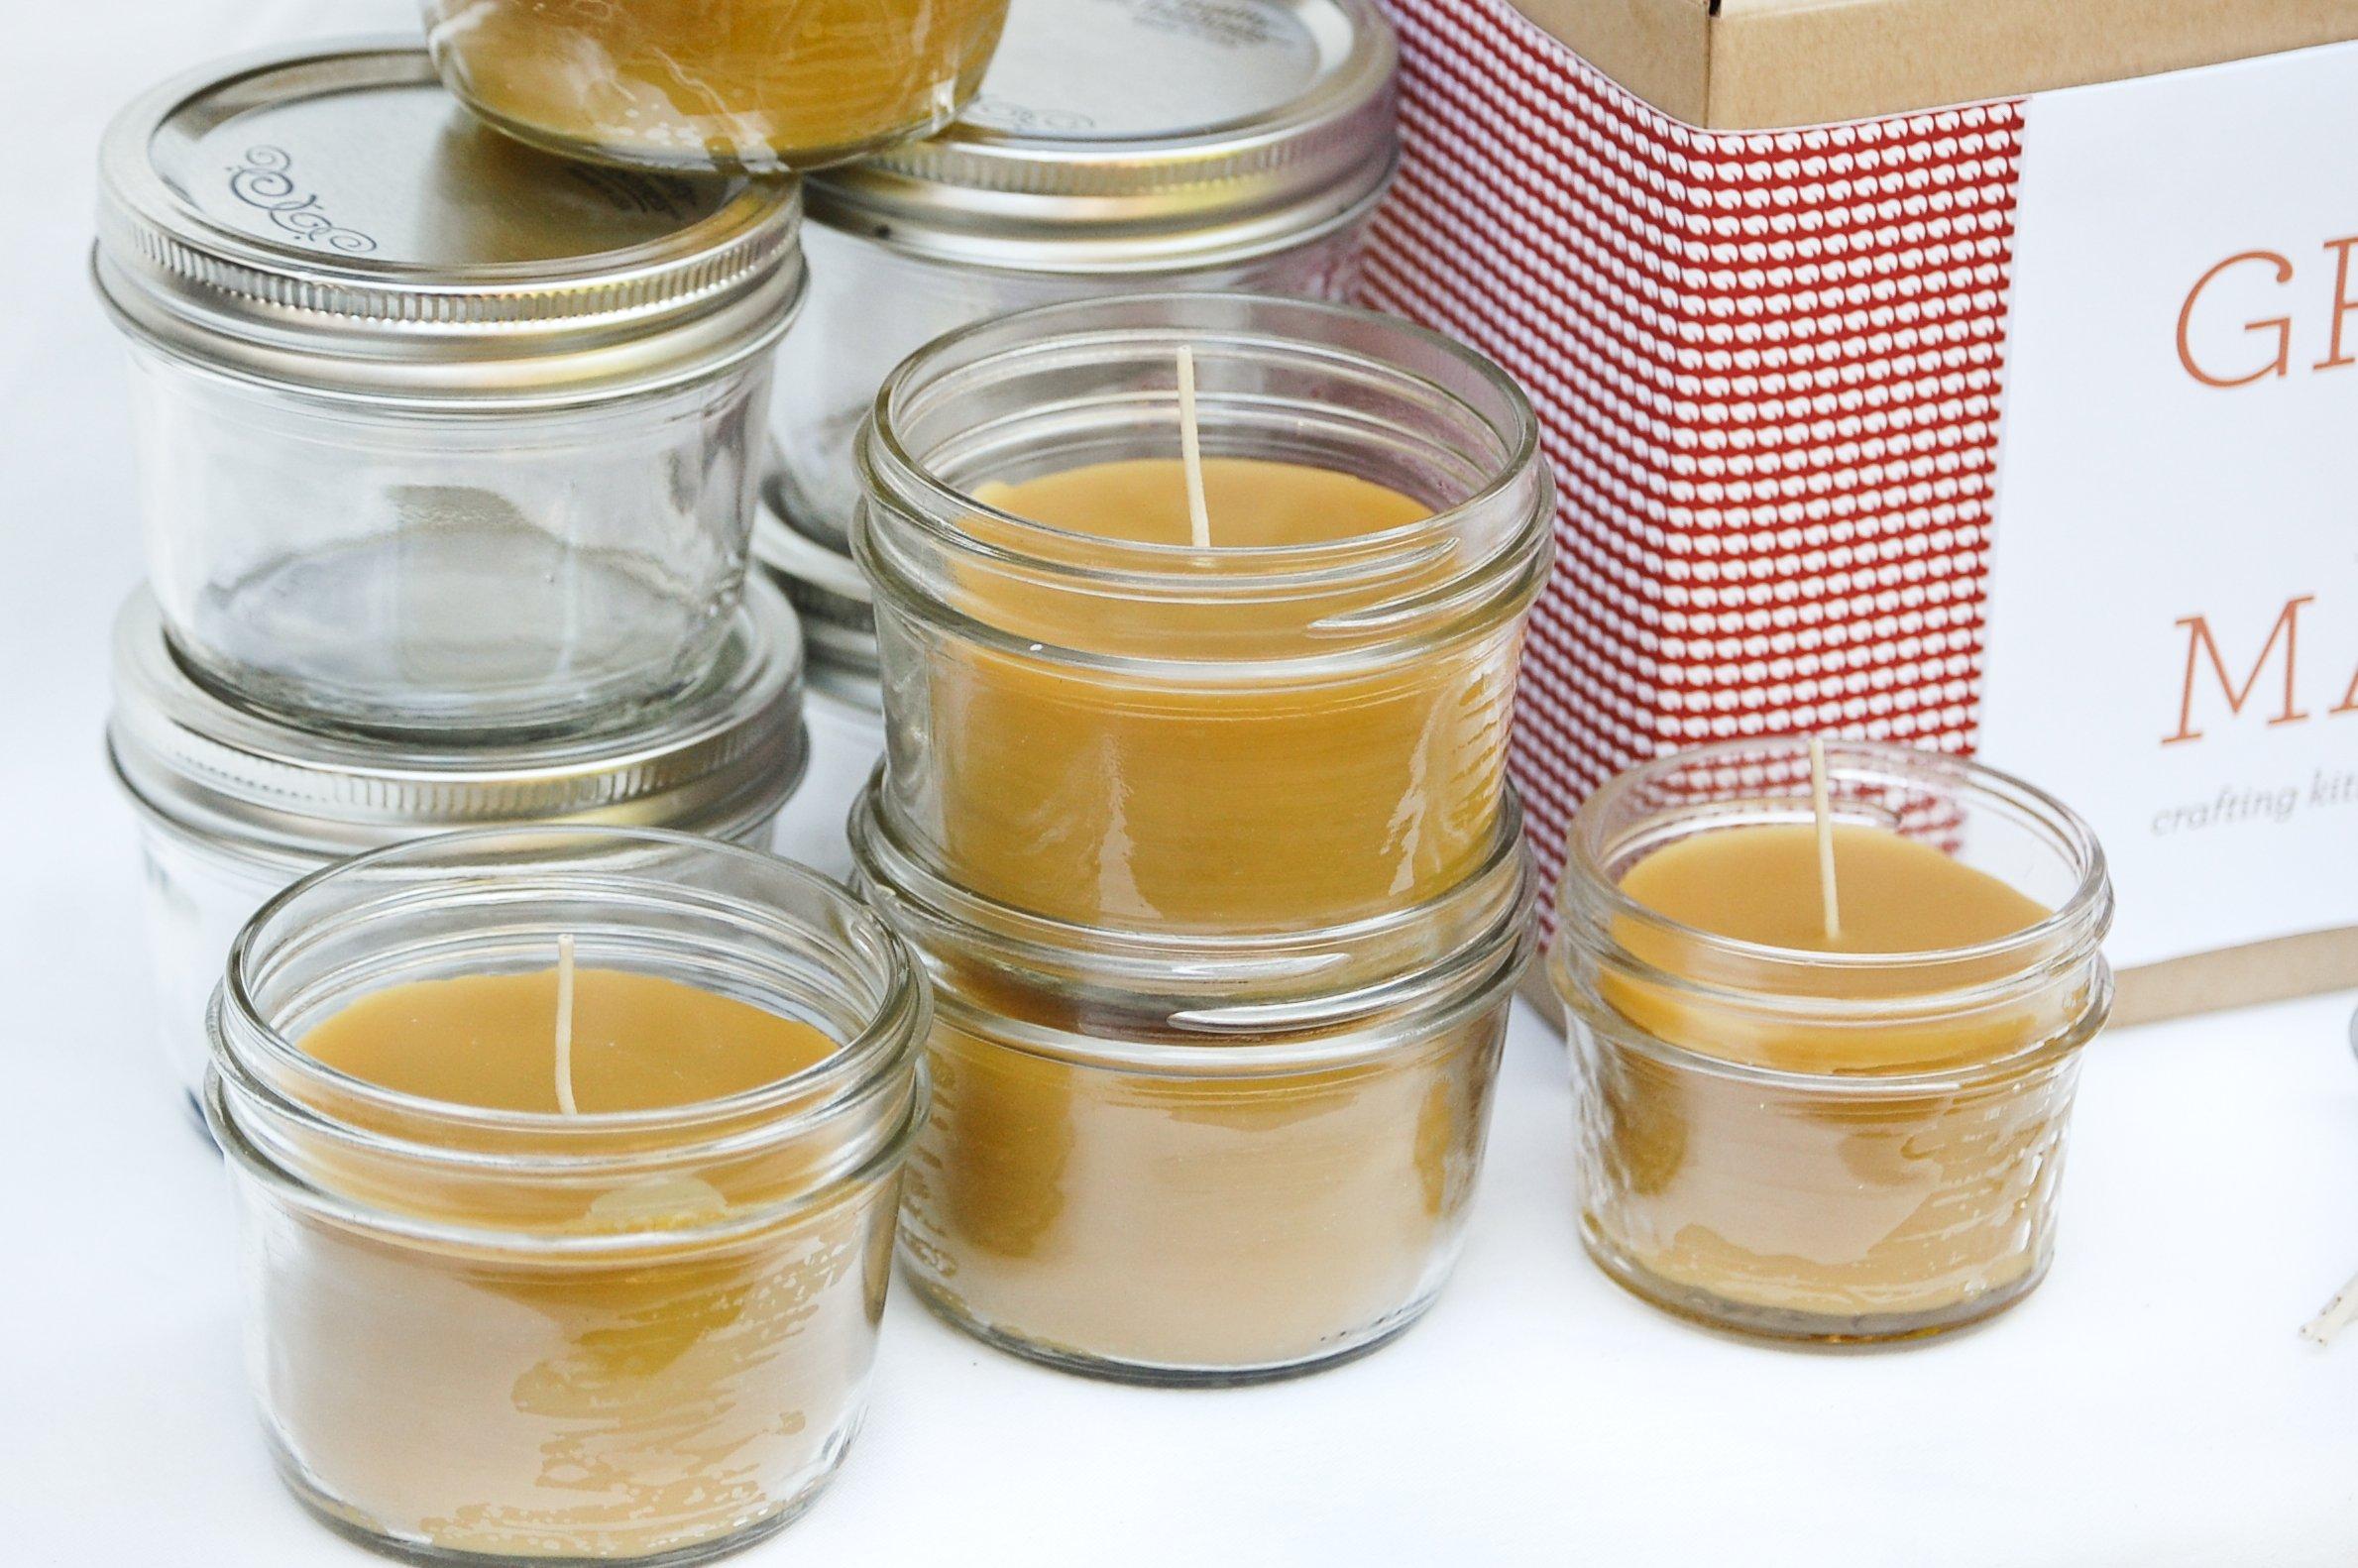 Deluxe DIY Beeswax Large Mason Jar Candle Making Kit - Makes 6 8oz Candles